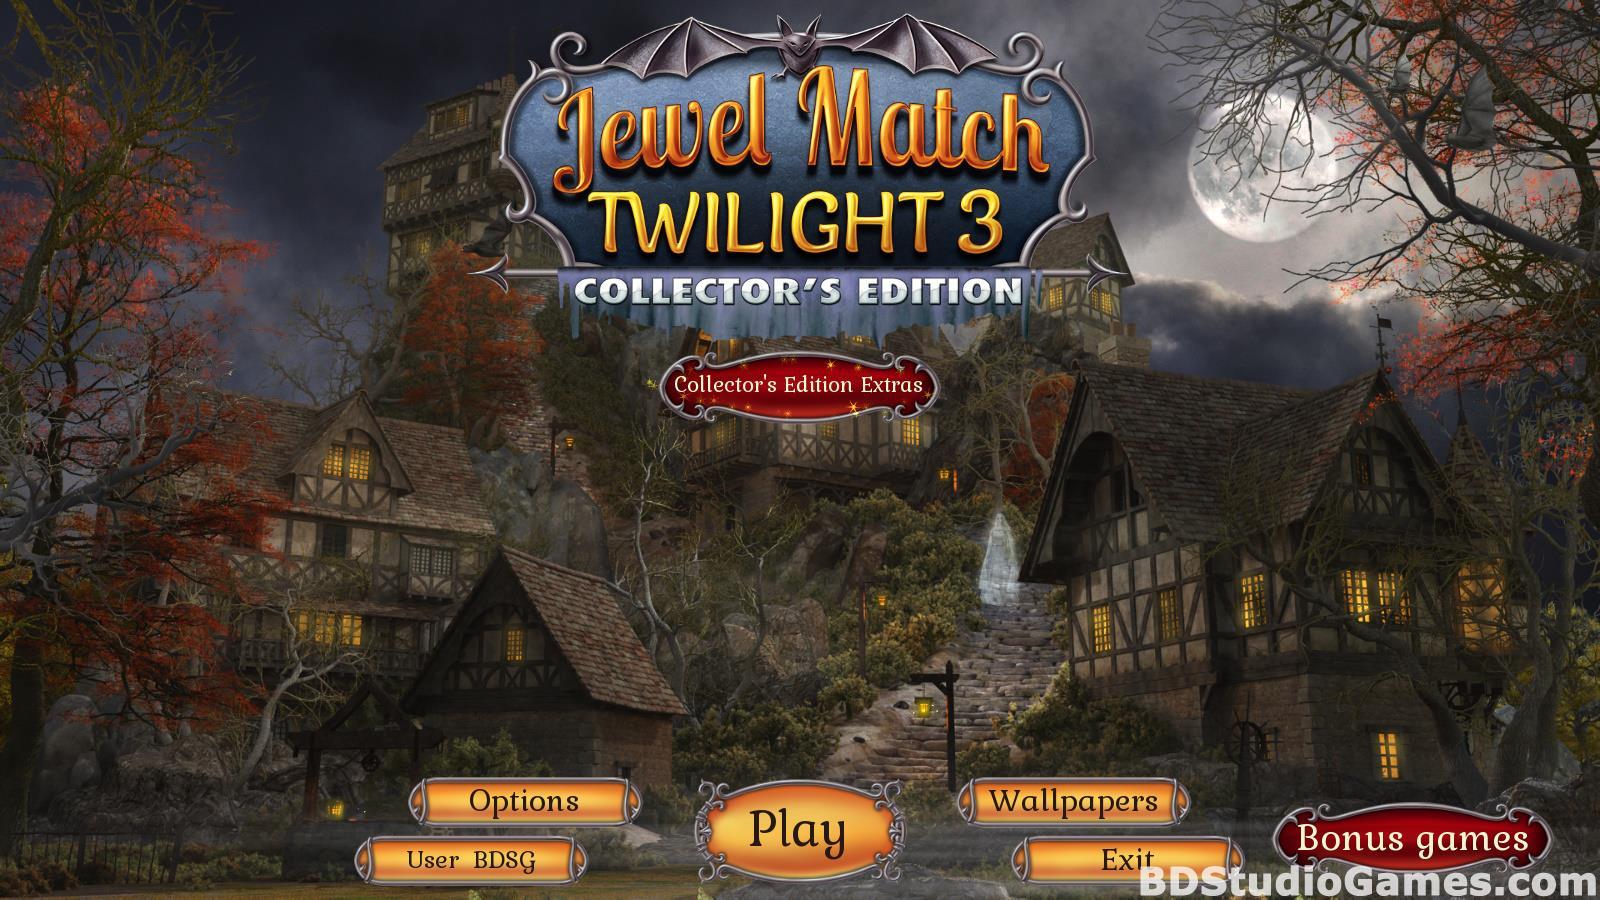 Jewel Match Twilight 3 Collector's Edition Screenshots 01